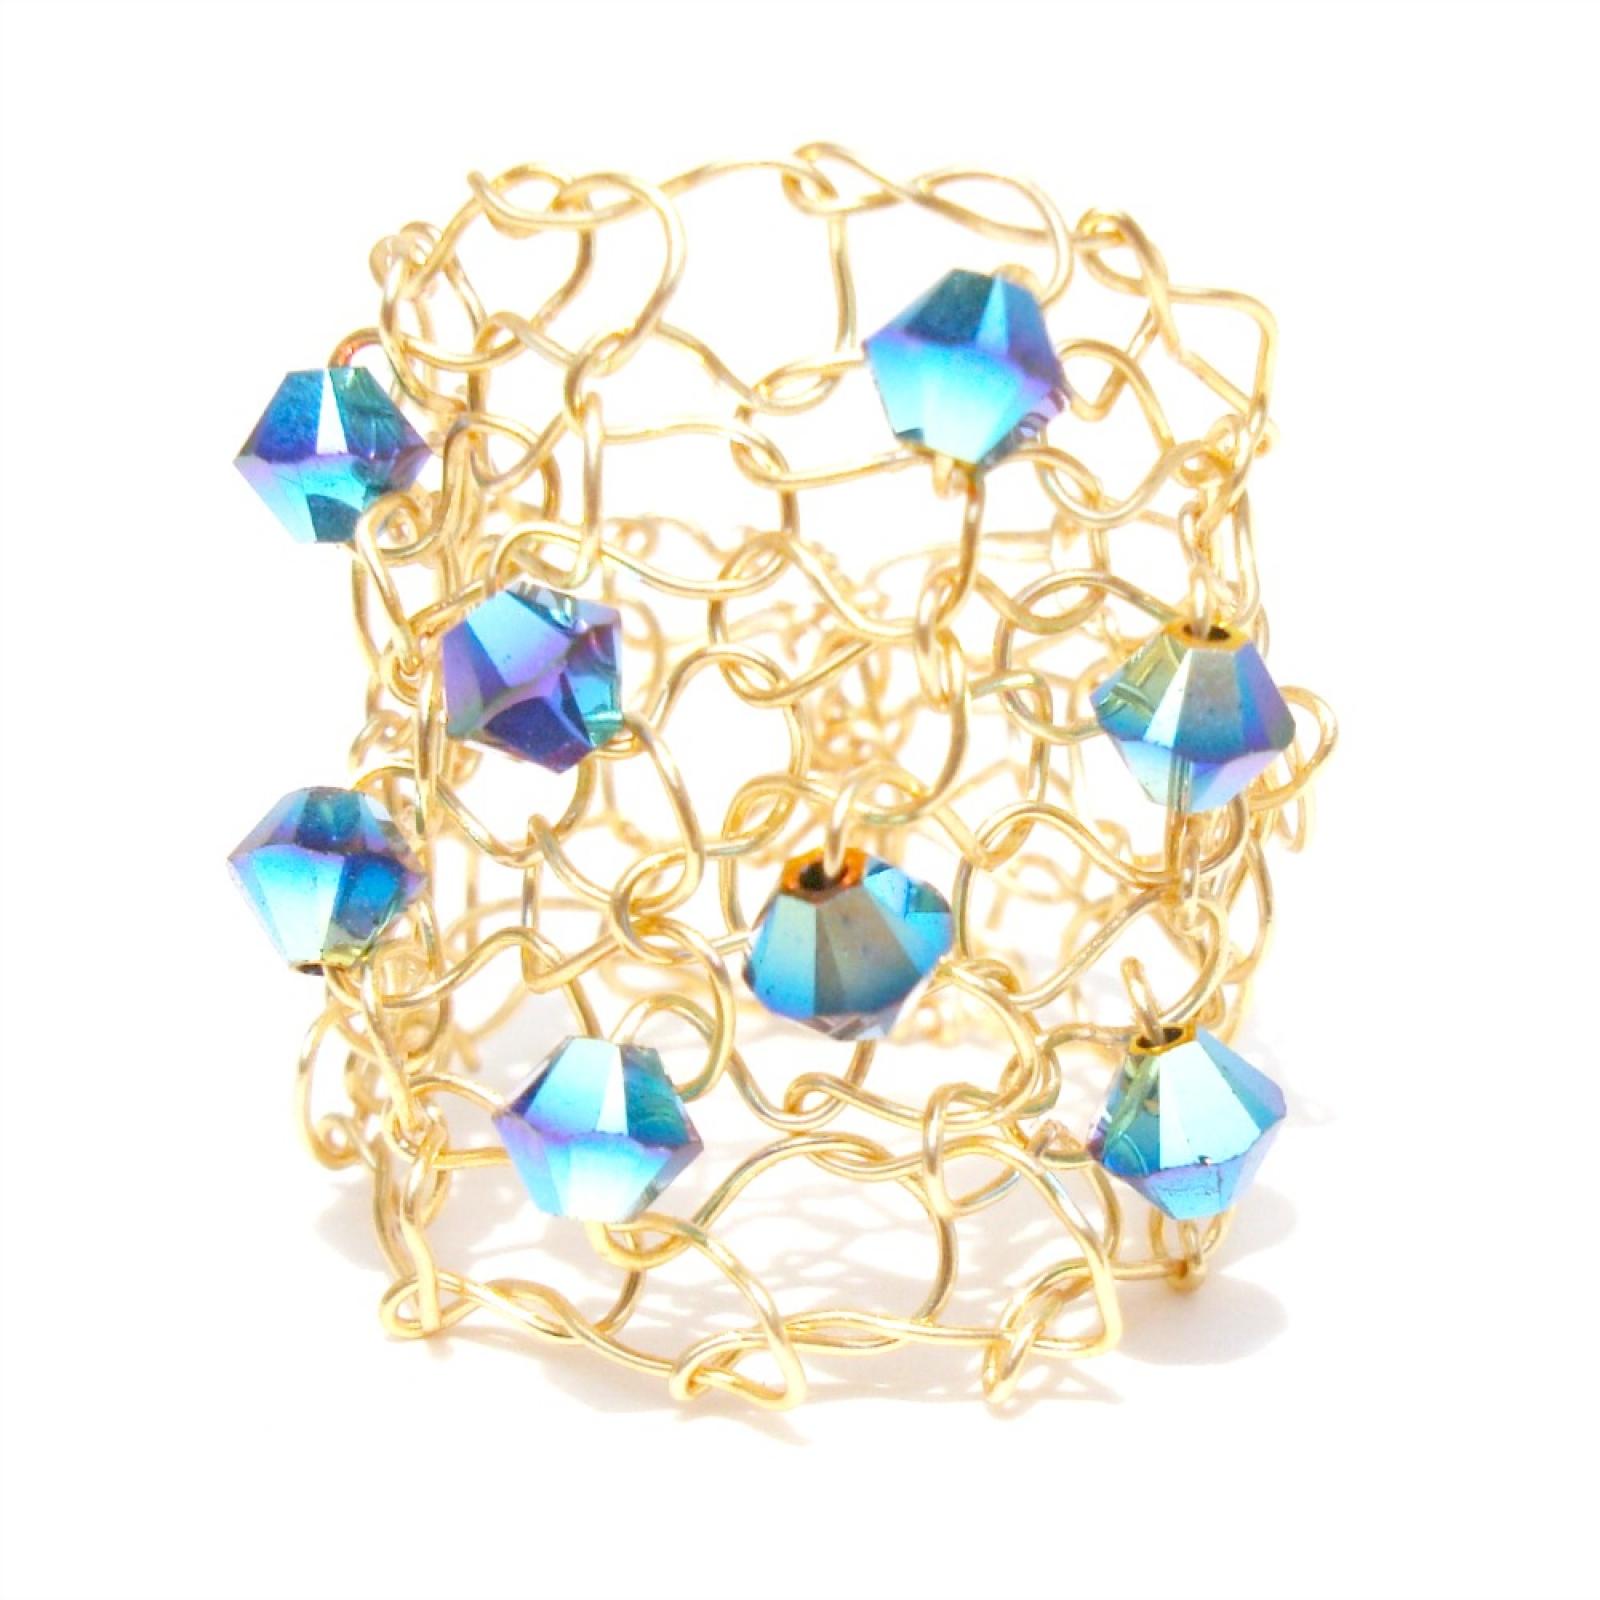 75e6183886f4b2 Swarovski Crystal Mermaid Ring